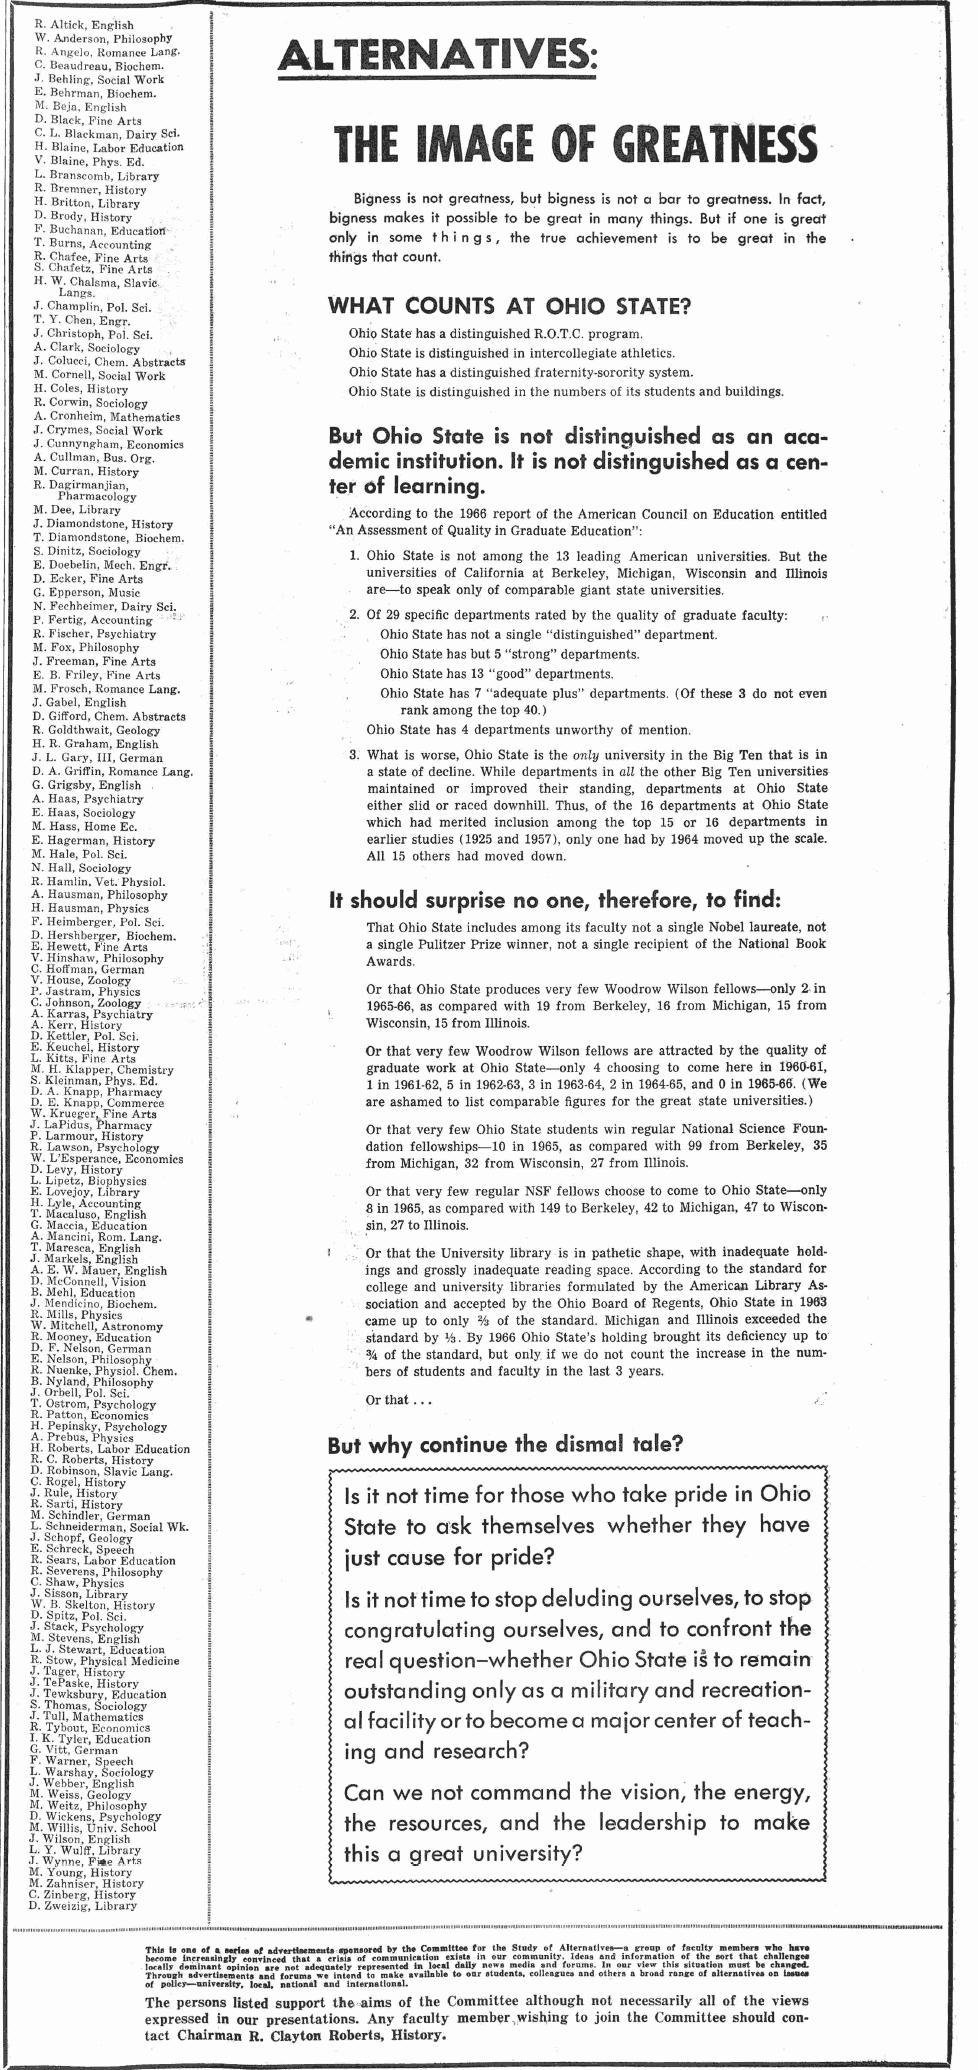 The Ohio State University Press: Ohio State University in the Sixties